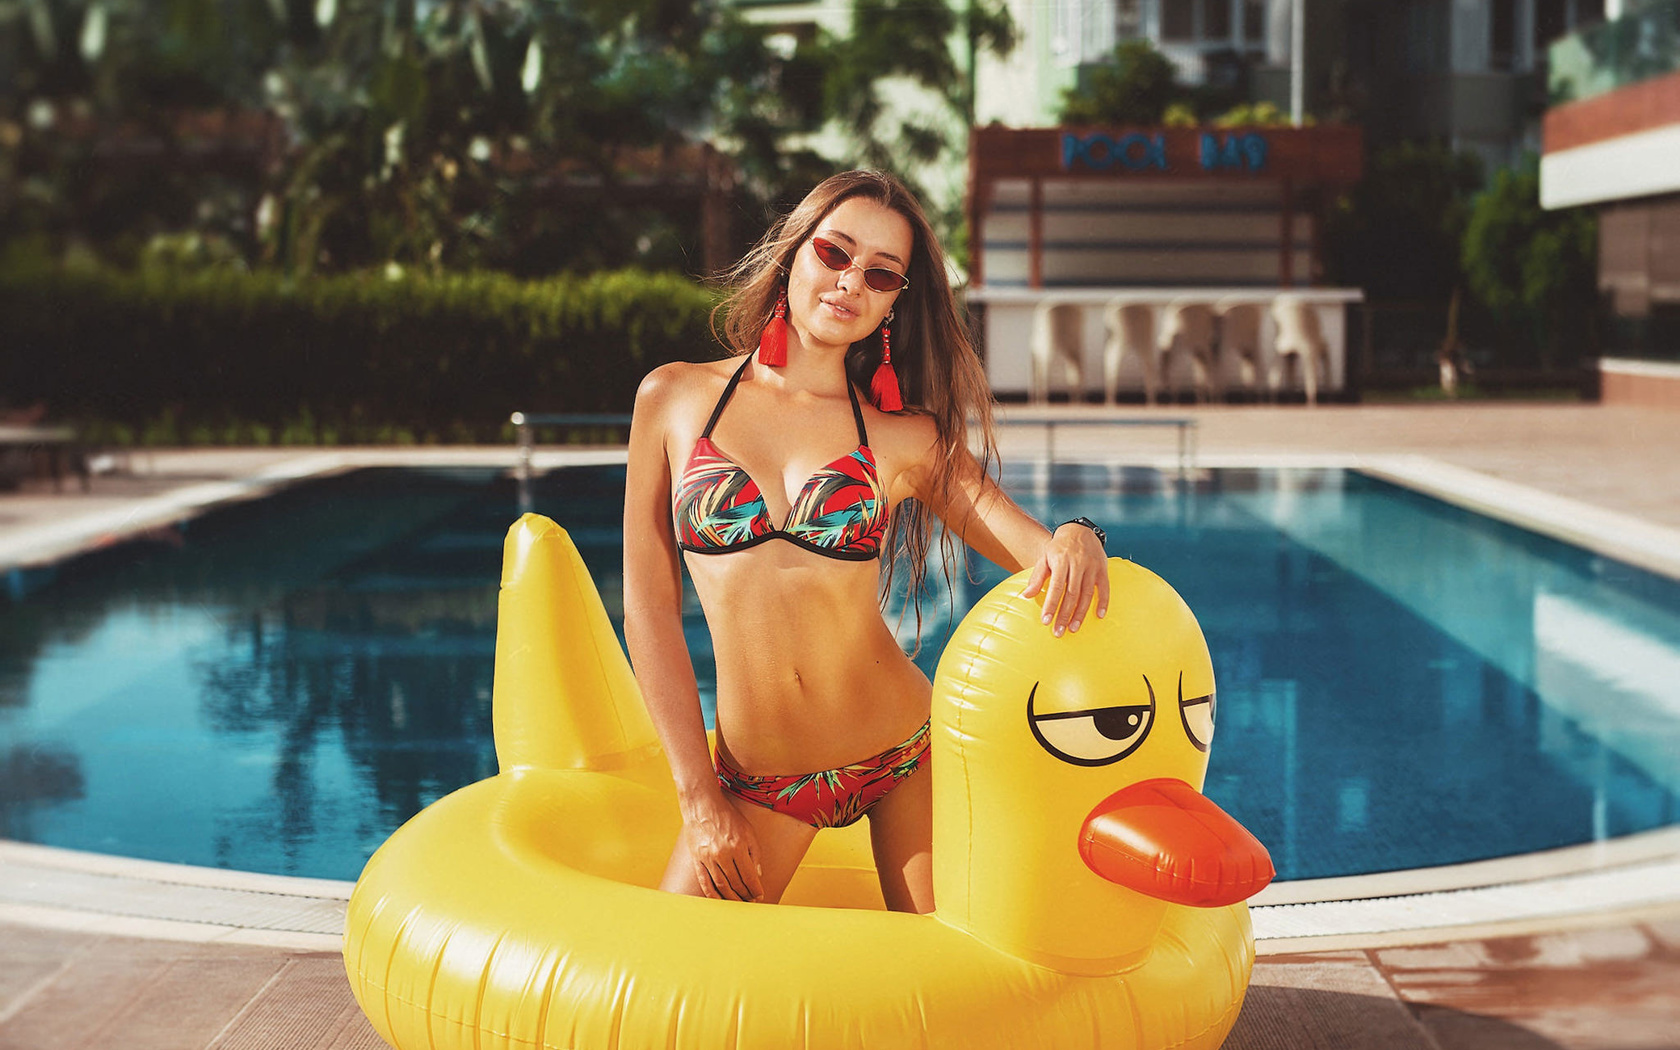 women, kneeling, bikini, sunglasses, swimming pool, inflatable chair, watch, belly, women outdoors, smiling, brunette